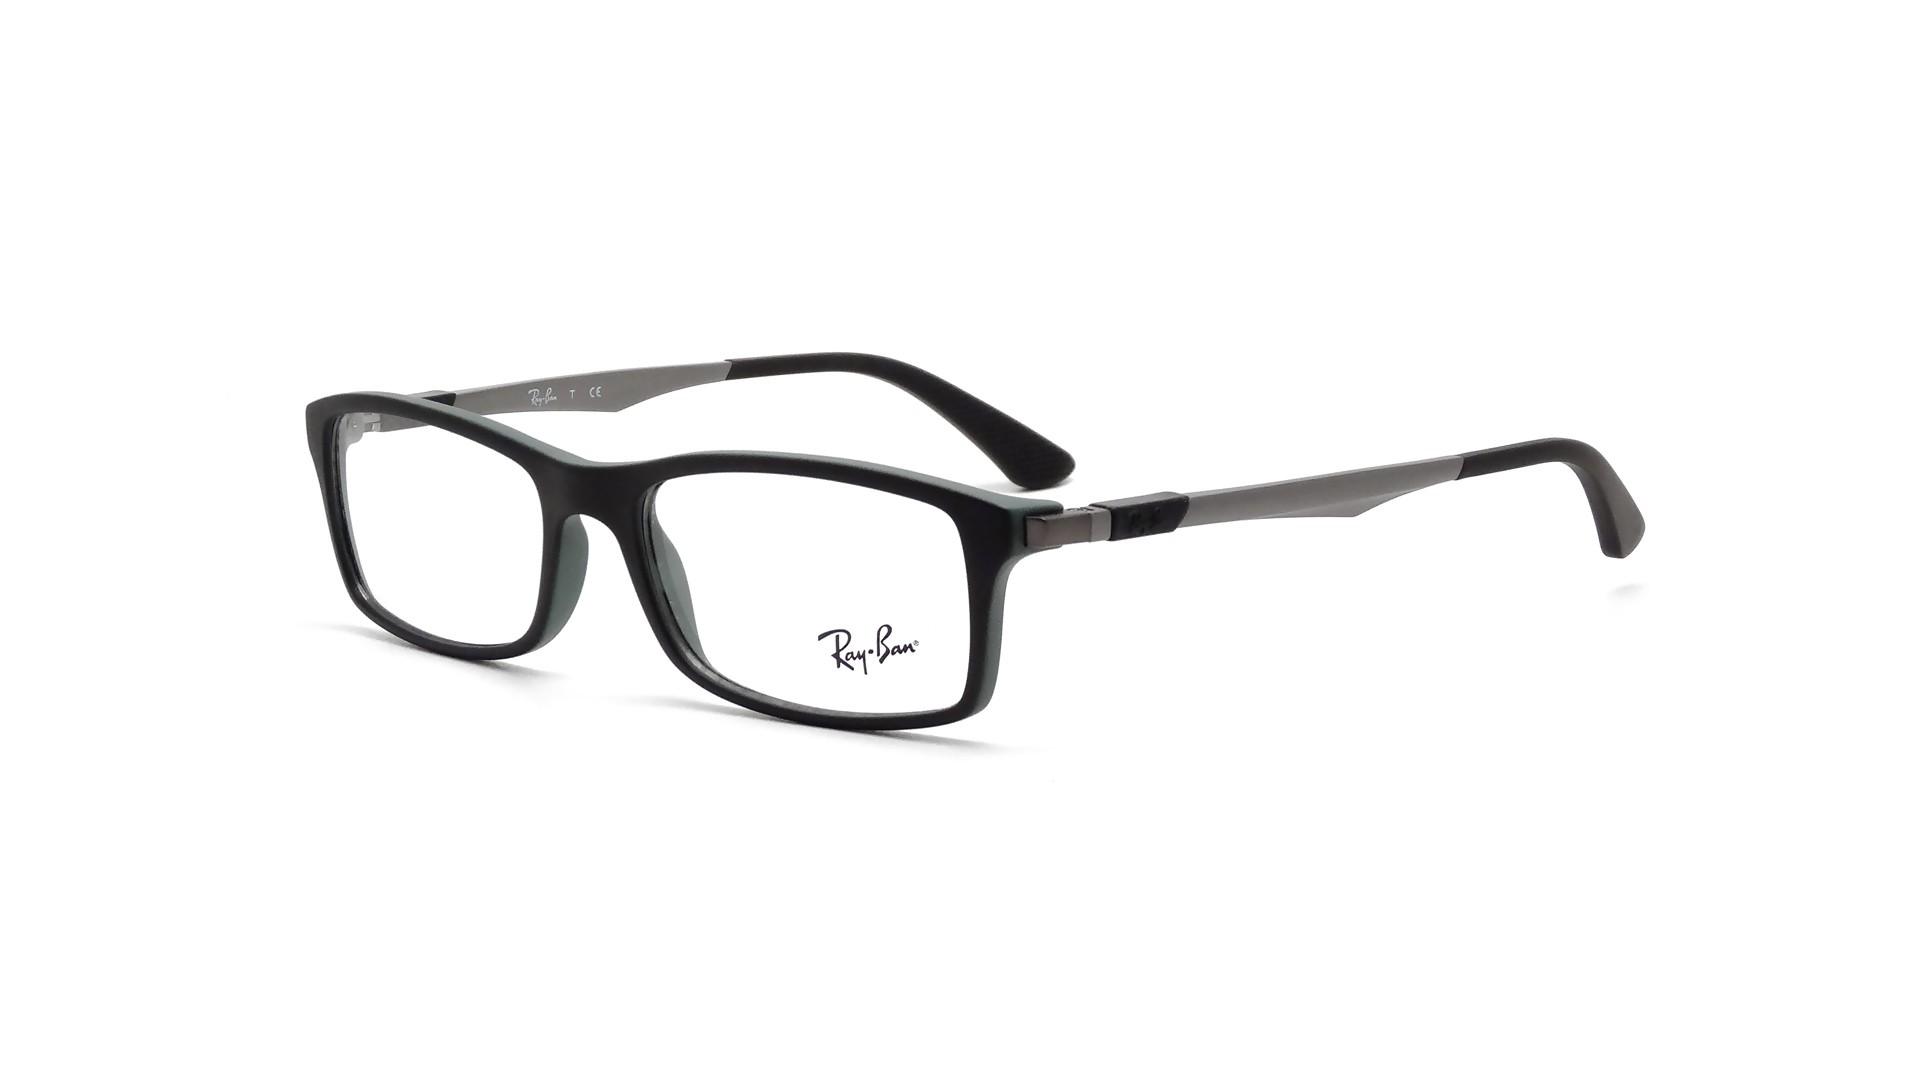 44b5140dd9 Ray Ban Rb 7017 5197 Glasses